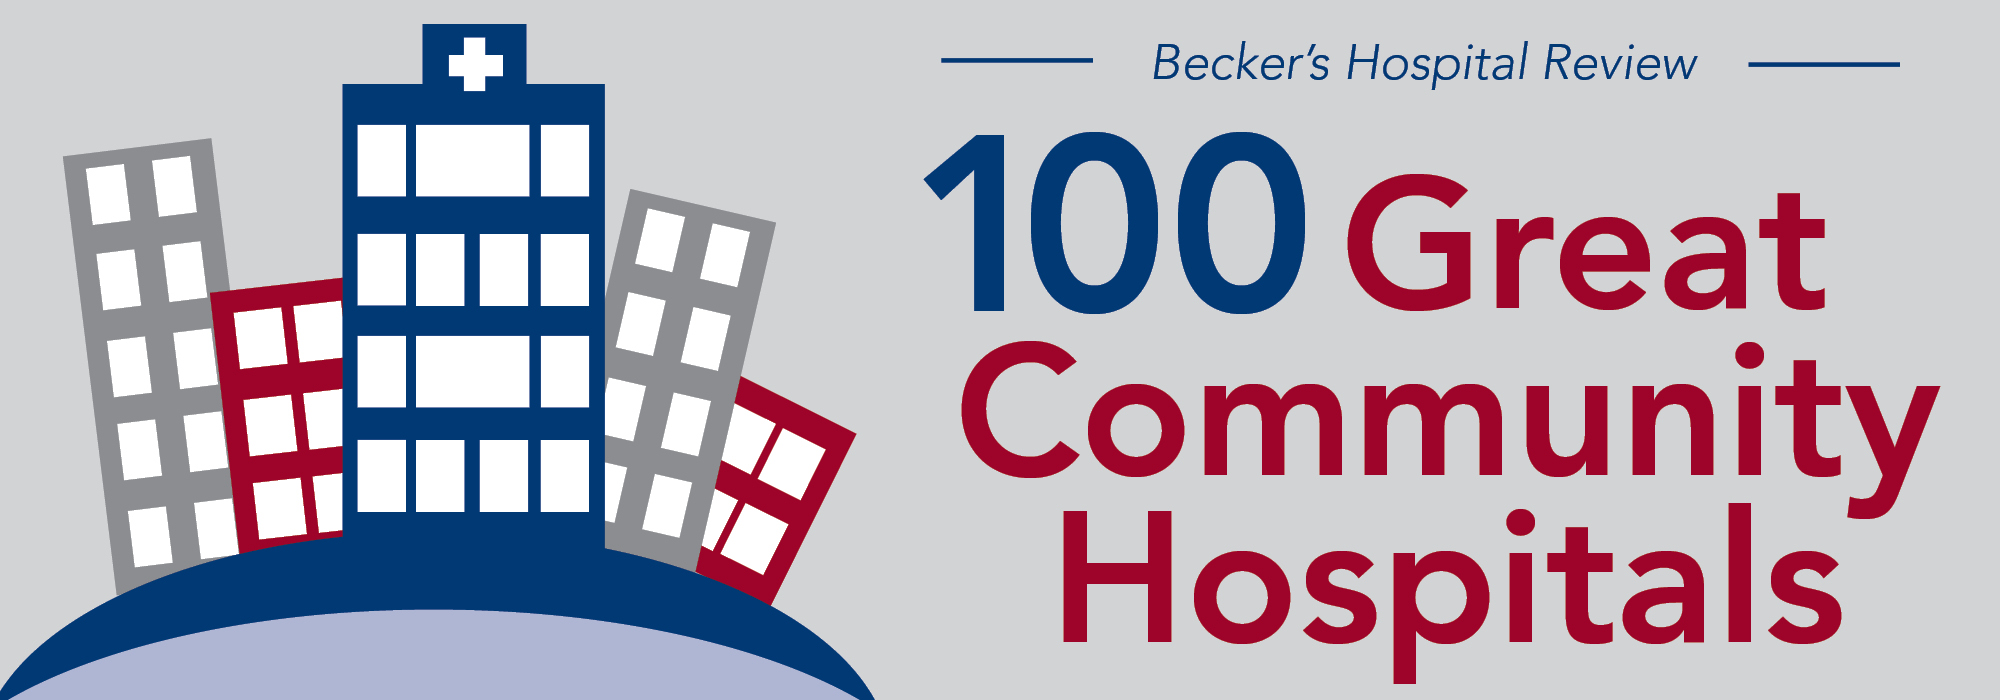 100 Great Community Hospitals 2017